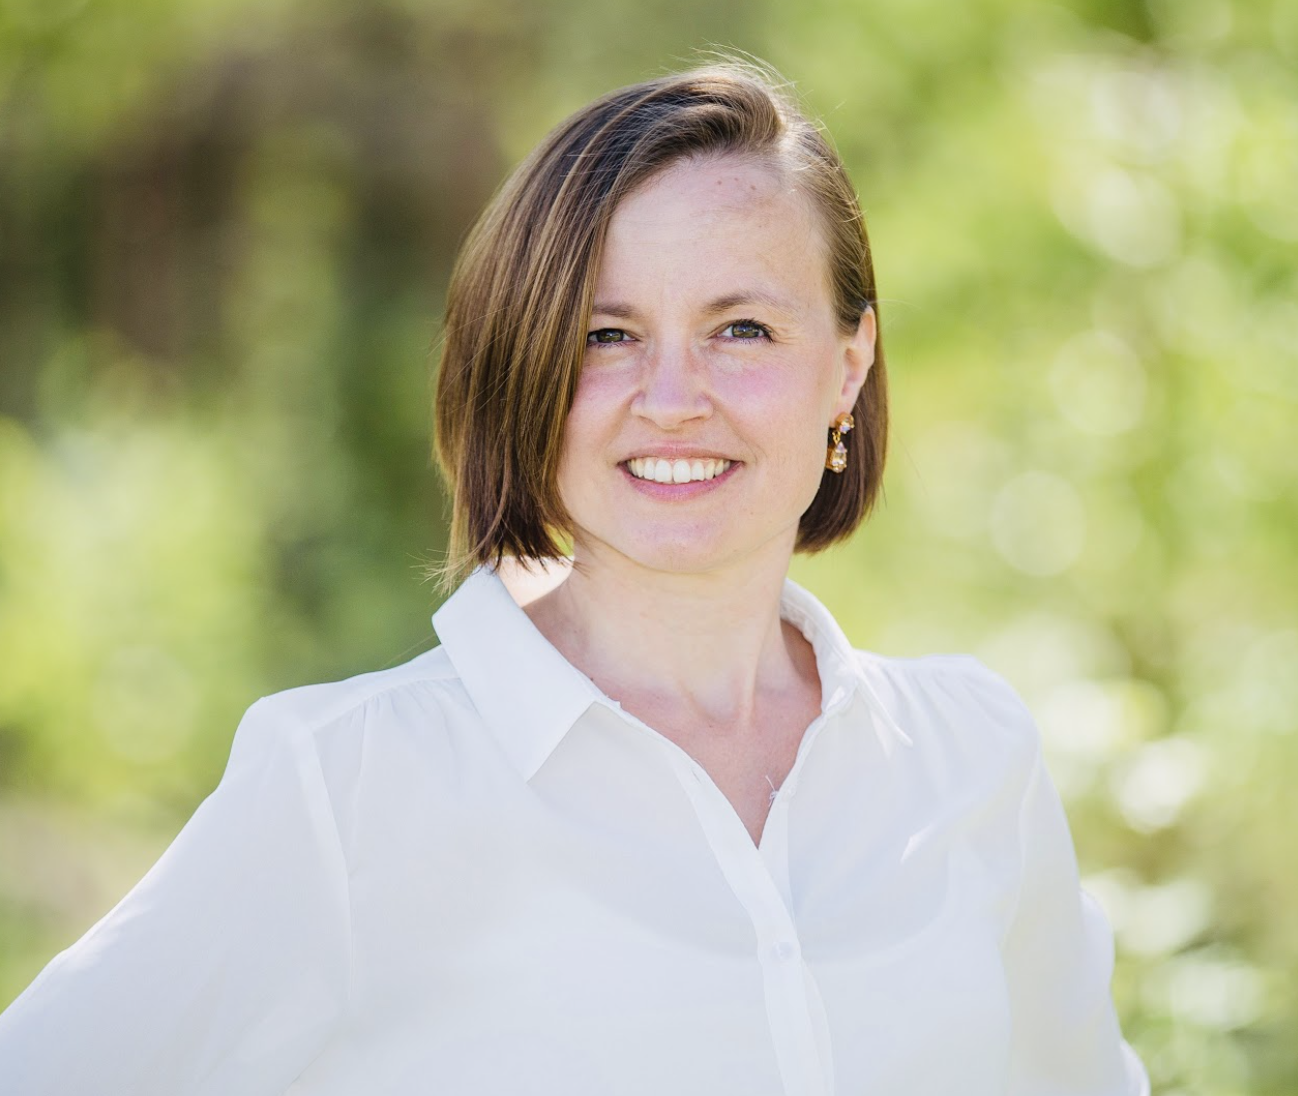 Eleonor Hedström